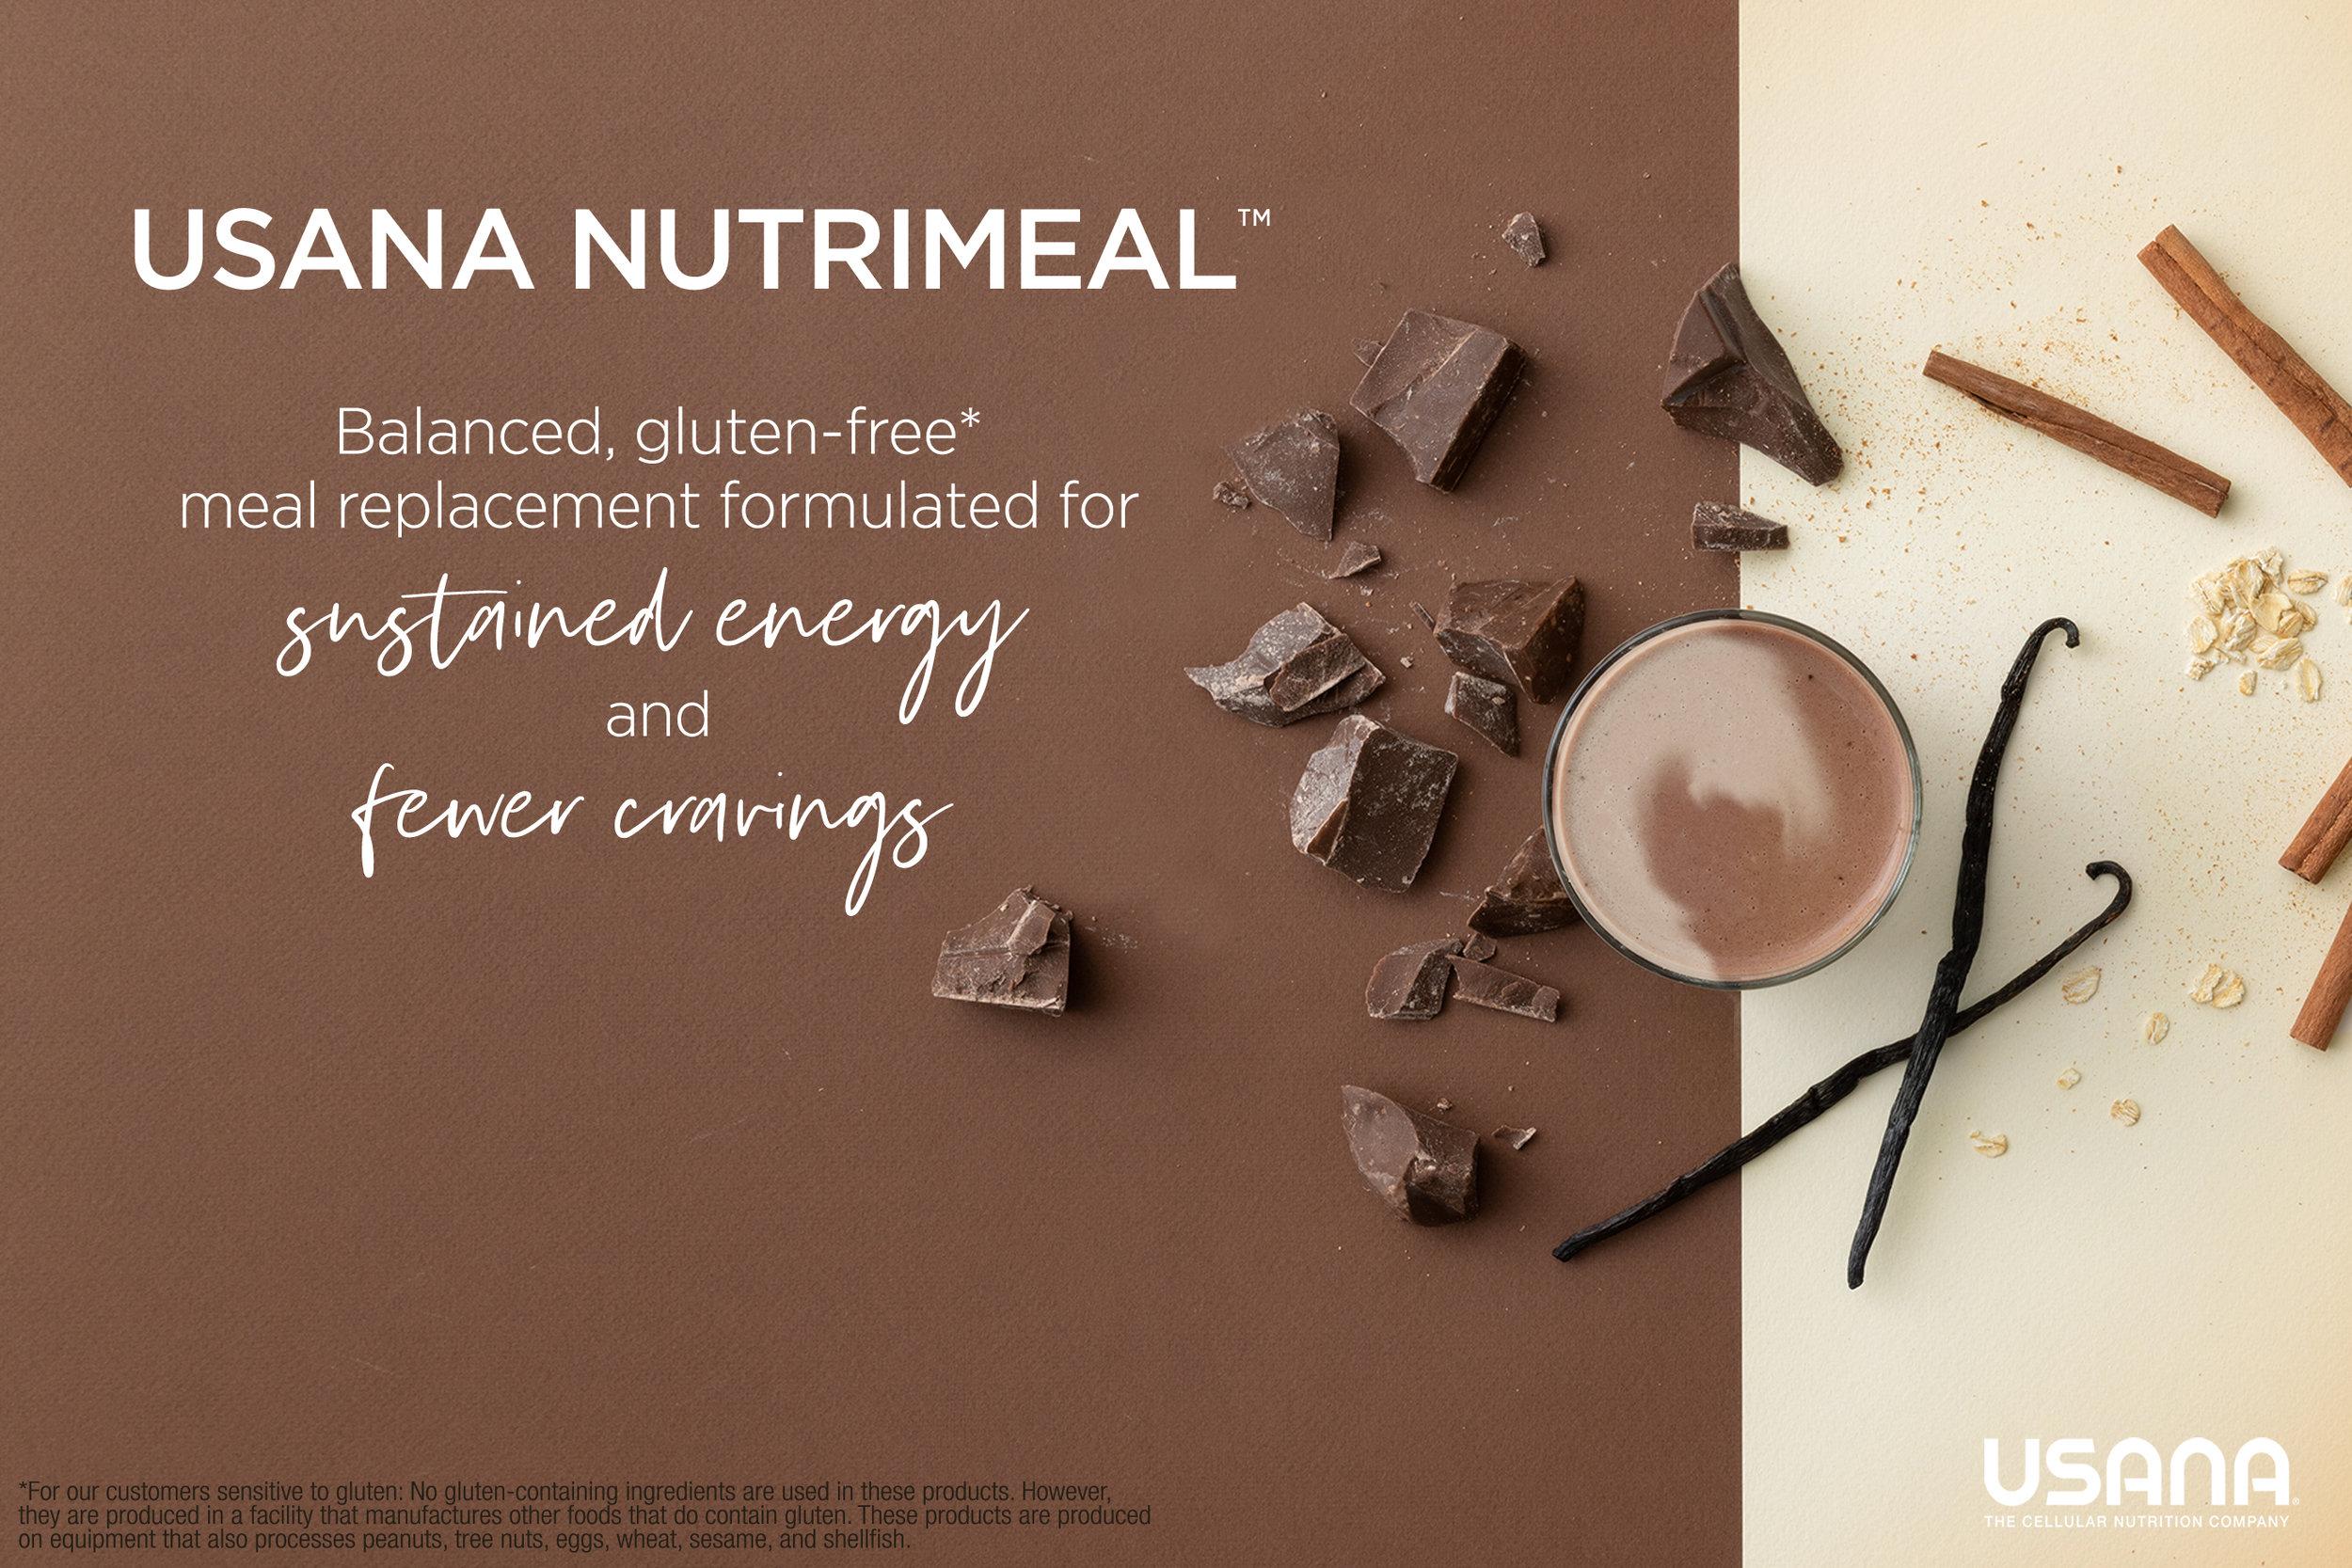 Foods_ Nutrimeal Balanced Meal Replacement Social Shareable.jpeg